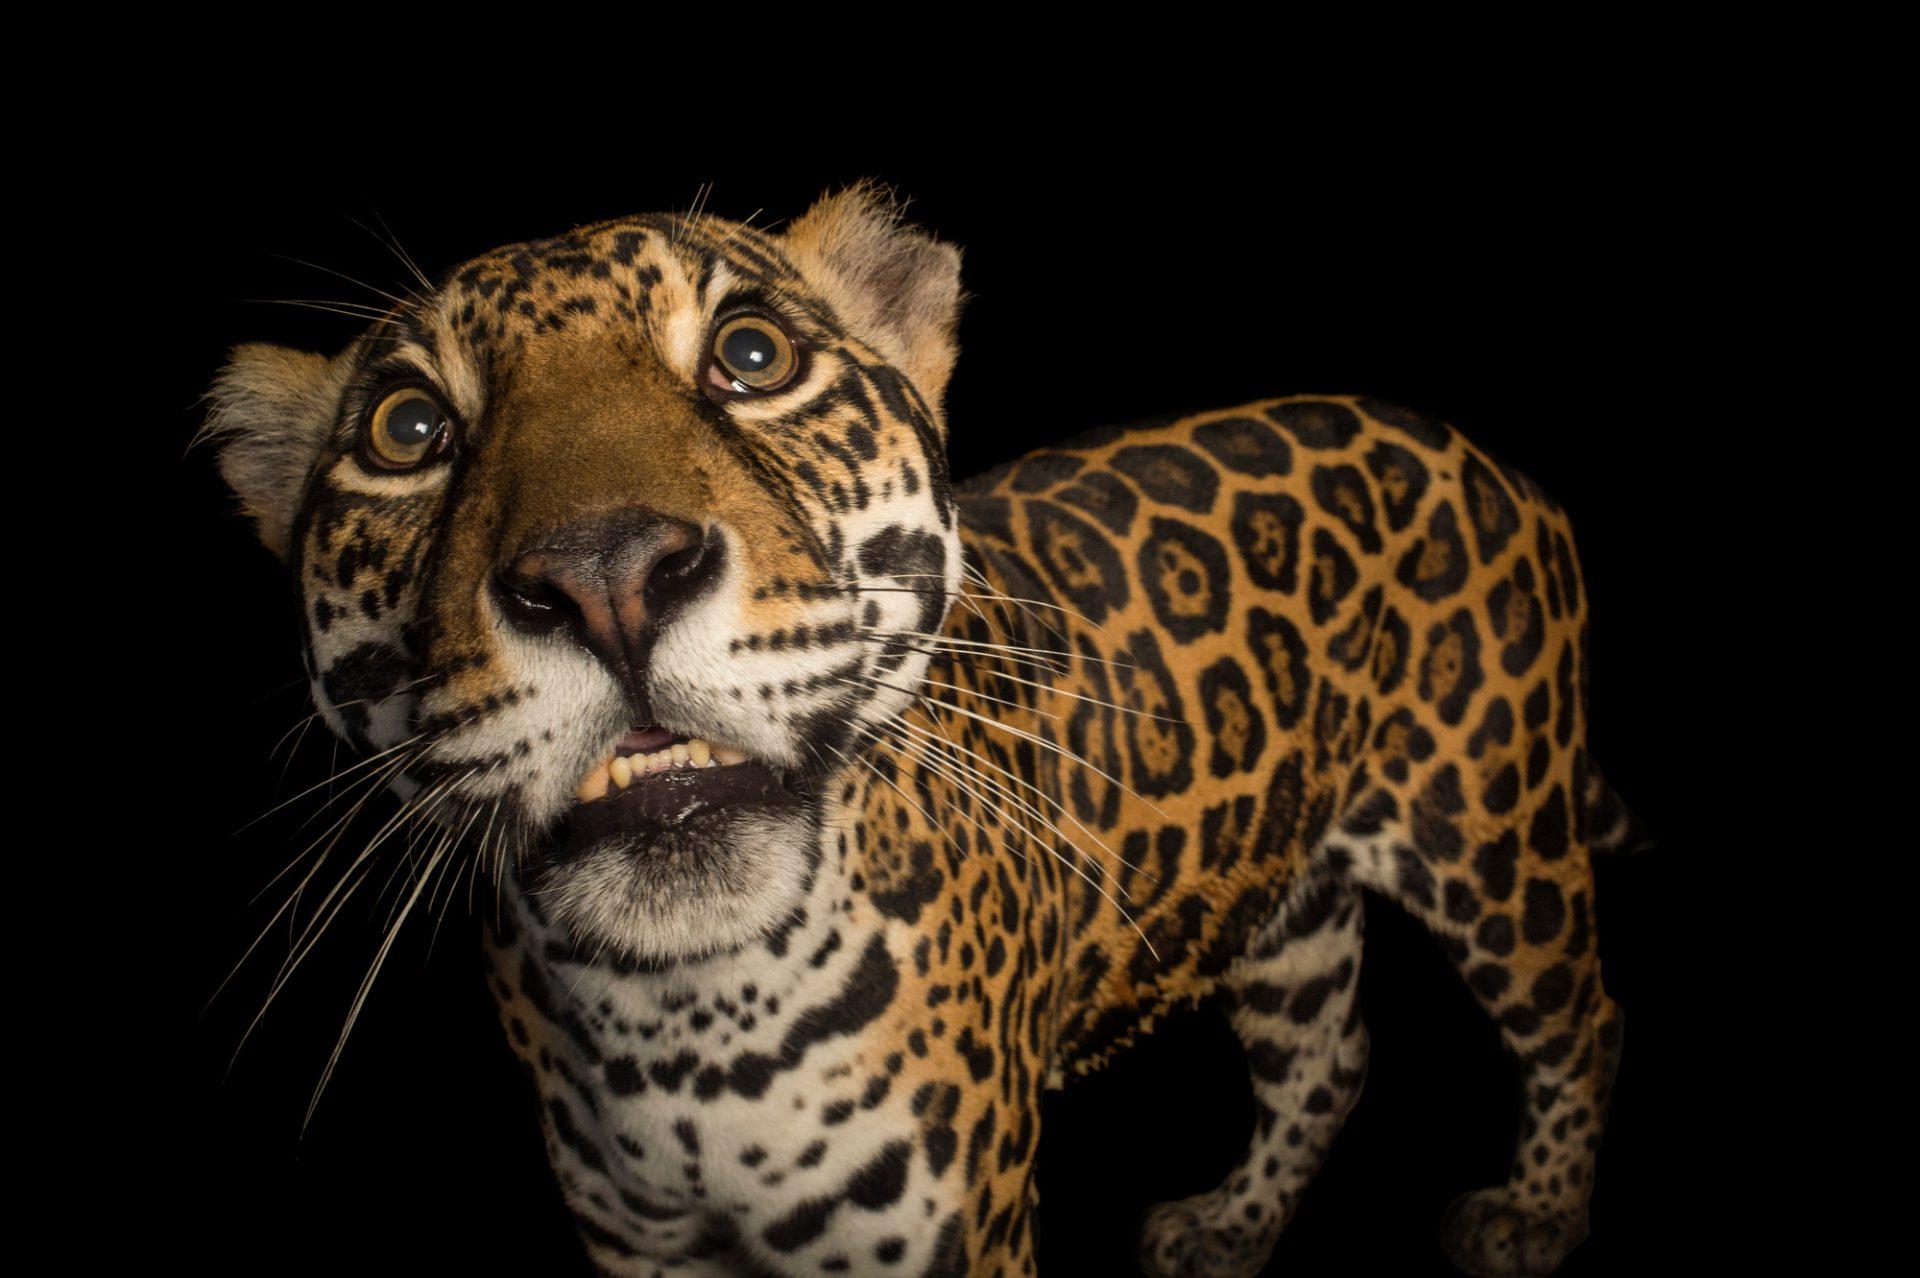 of event txgarage parkplace jag pushes status dallas pace elevating the place your cover park jaguar